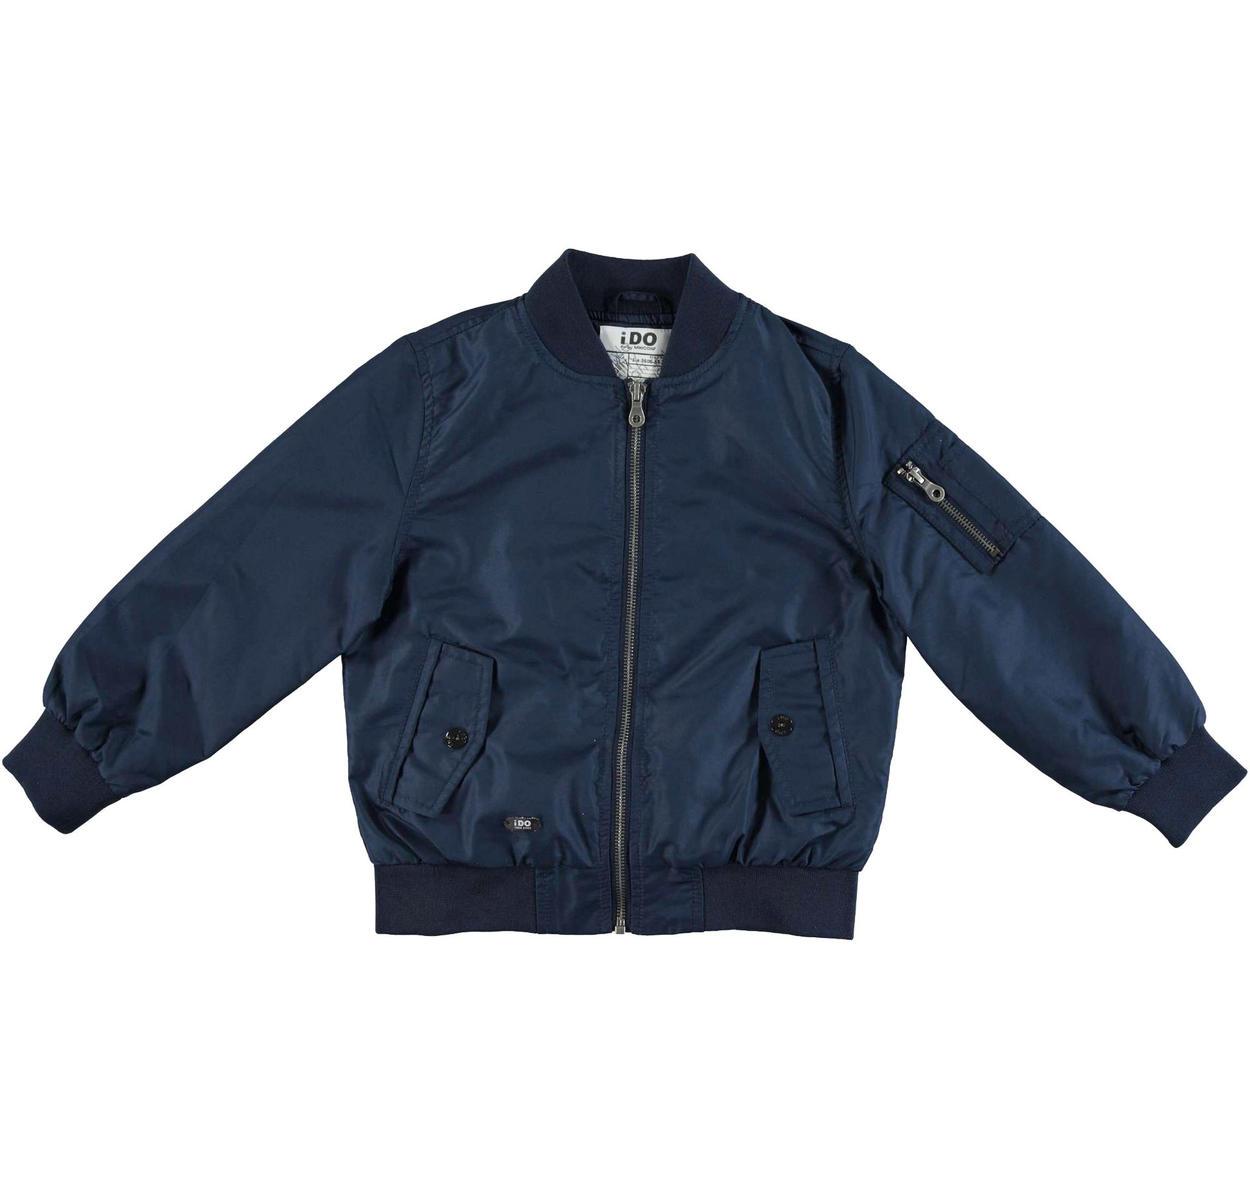 wholesale dealer a272b 0192a Giubbotto modello bomber per bambino da 6 a 16 anni iDO